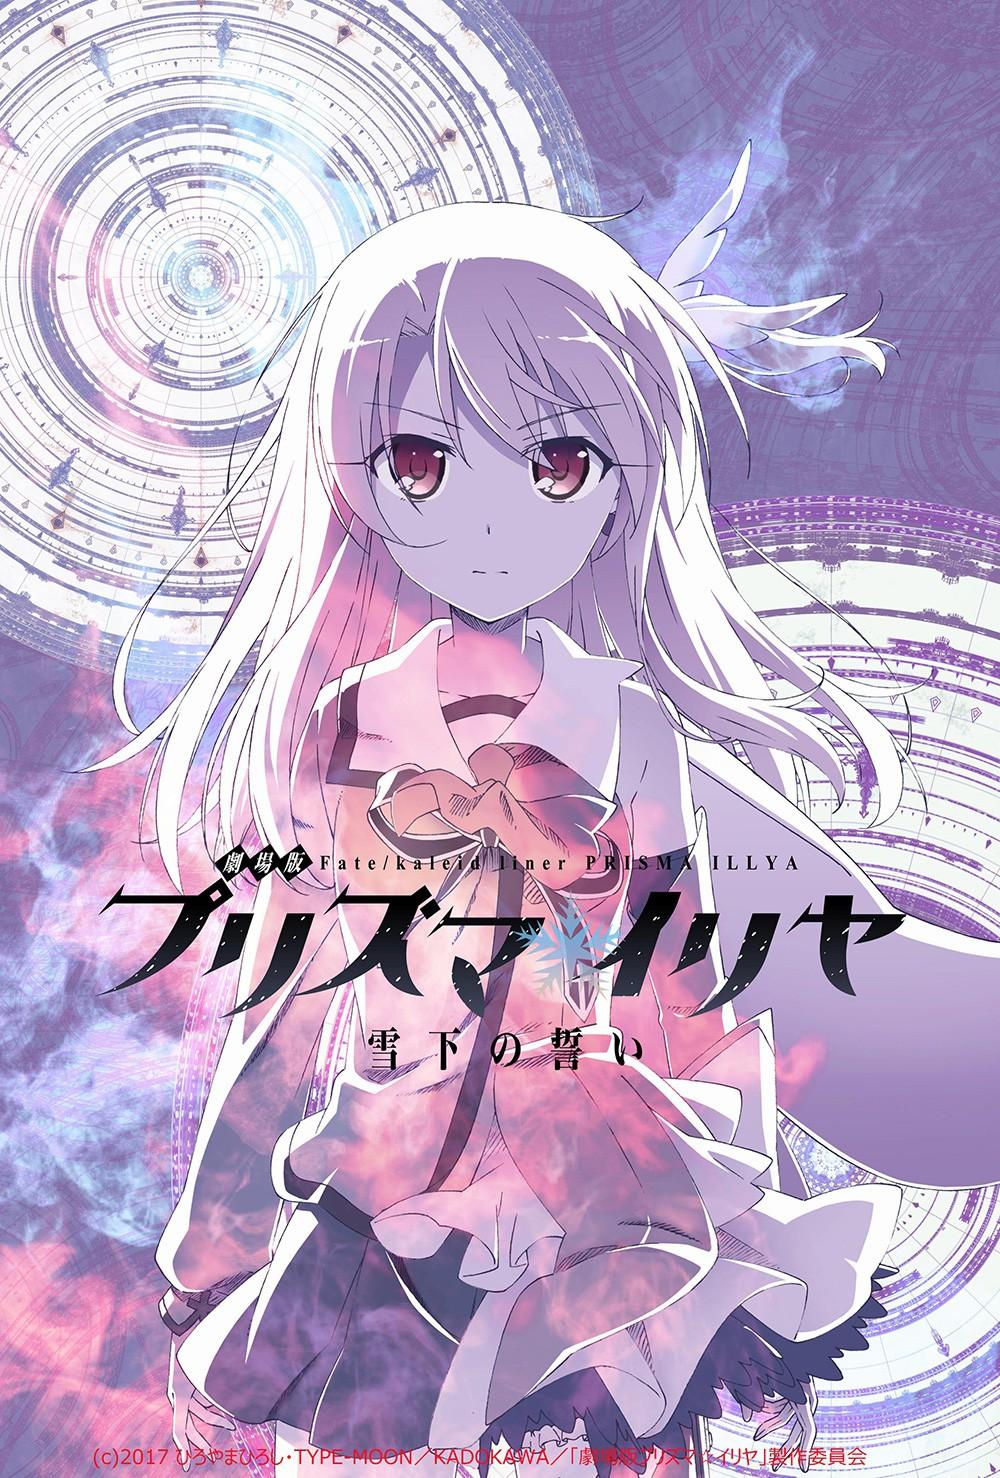 Fate-kaleid-liner-Prisma-Illya-Yukishita-no-Chikai-Visual